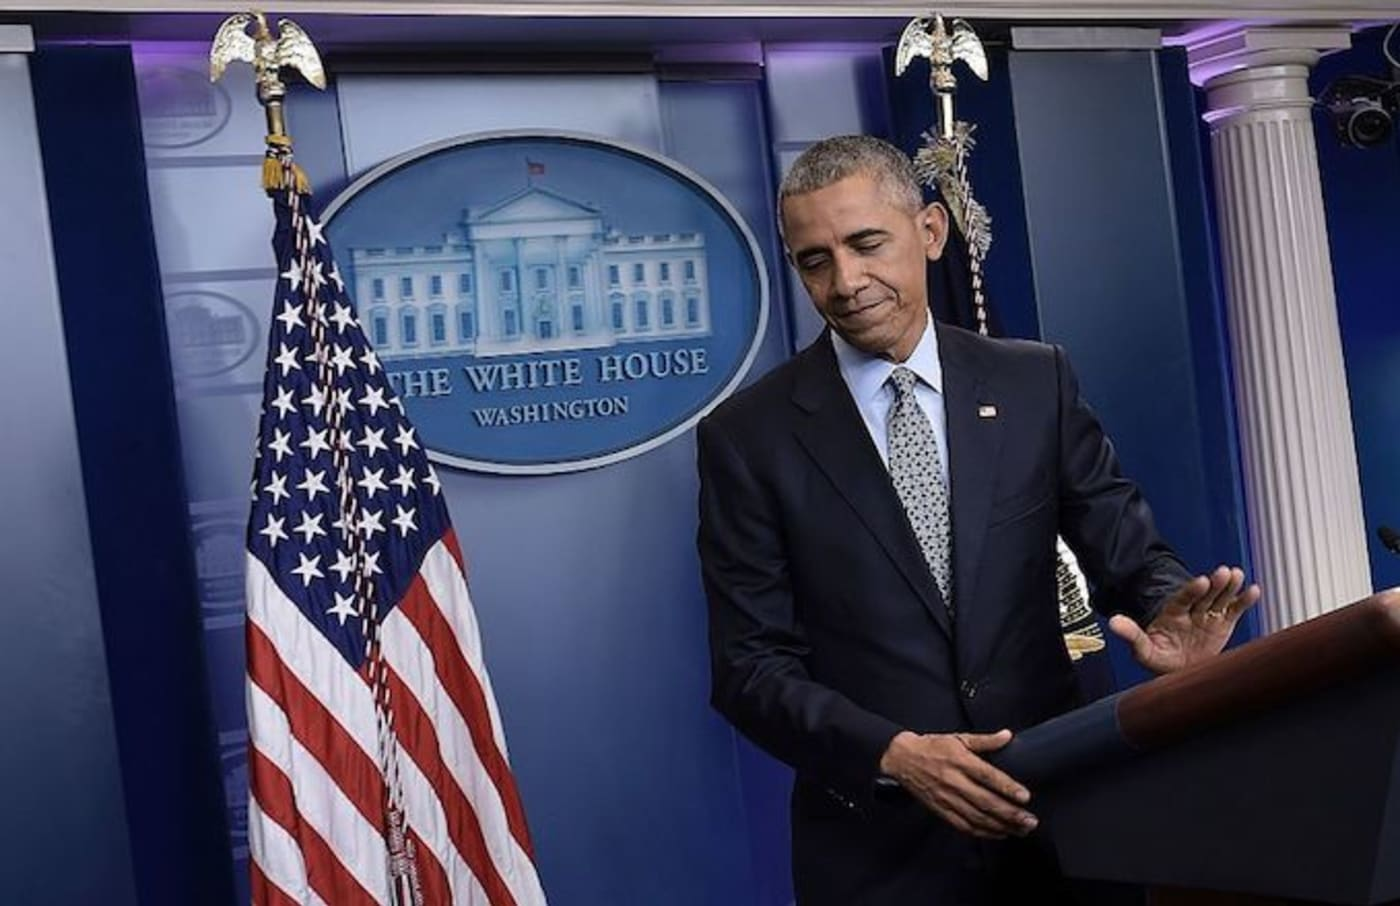 Obama final press conference